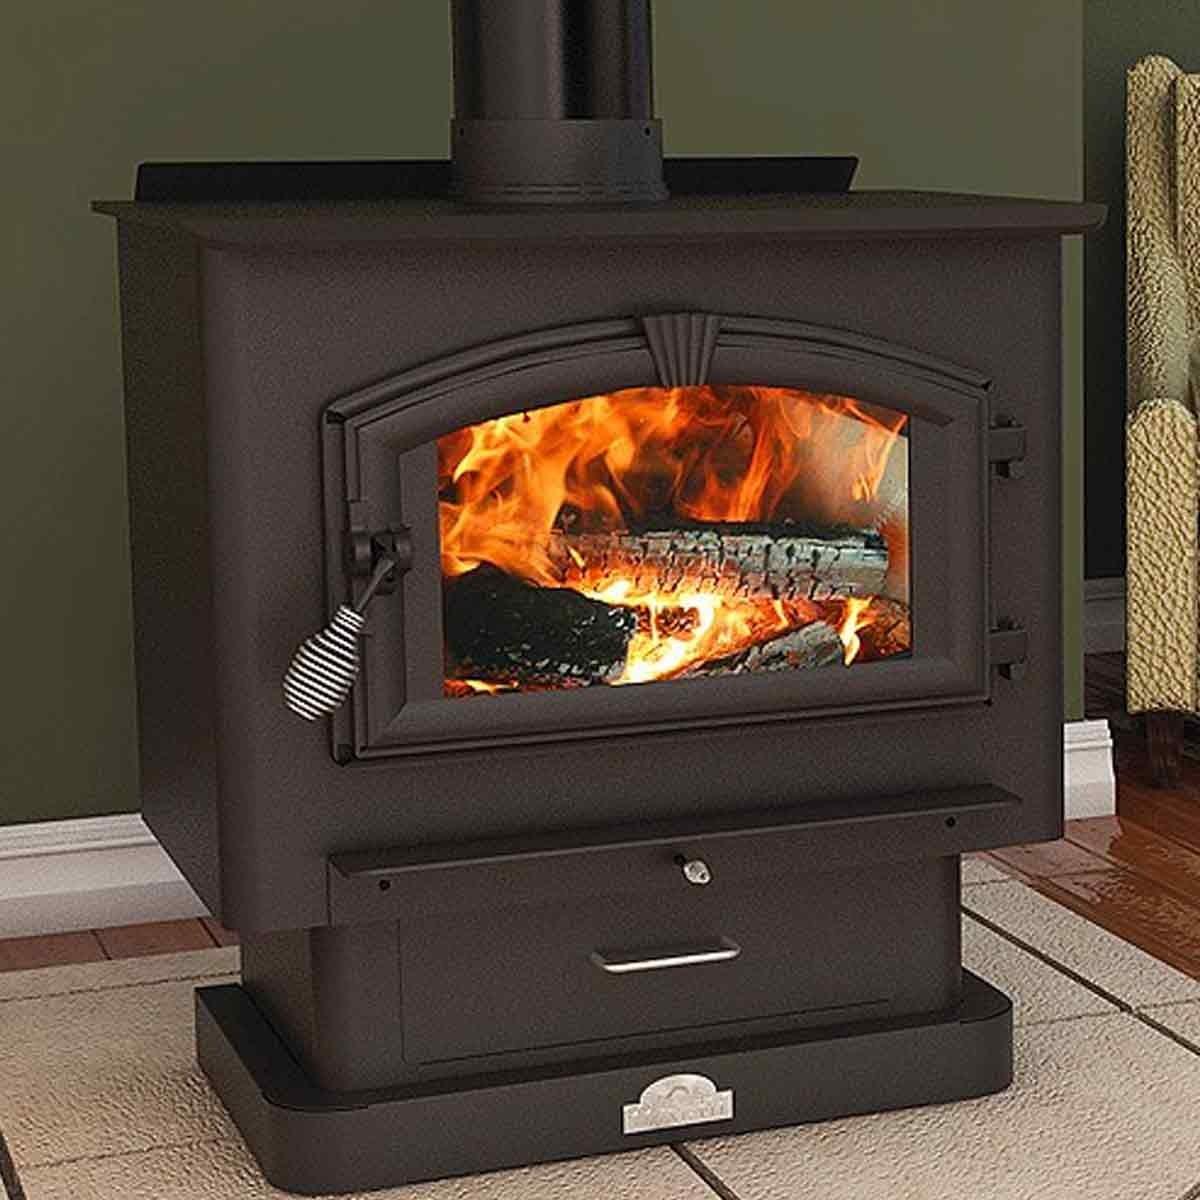 nle5sv 2000 07 u s stove medium epa certified woodburning stove with blower 2000